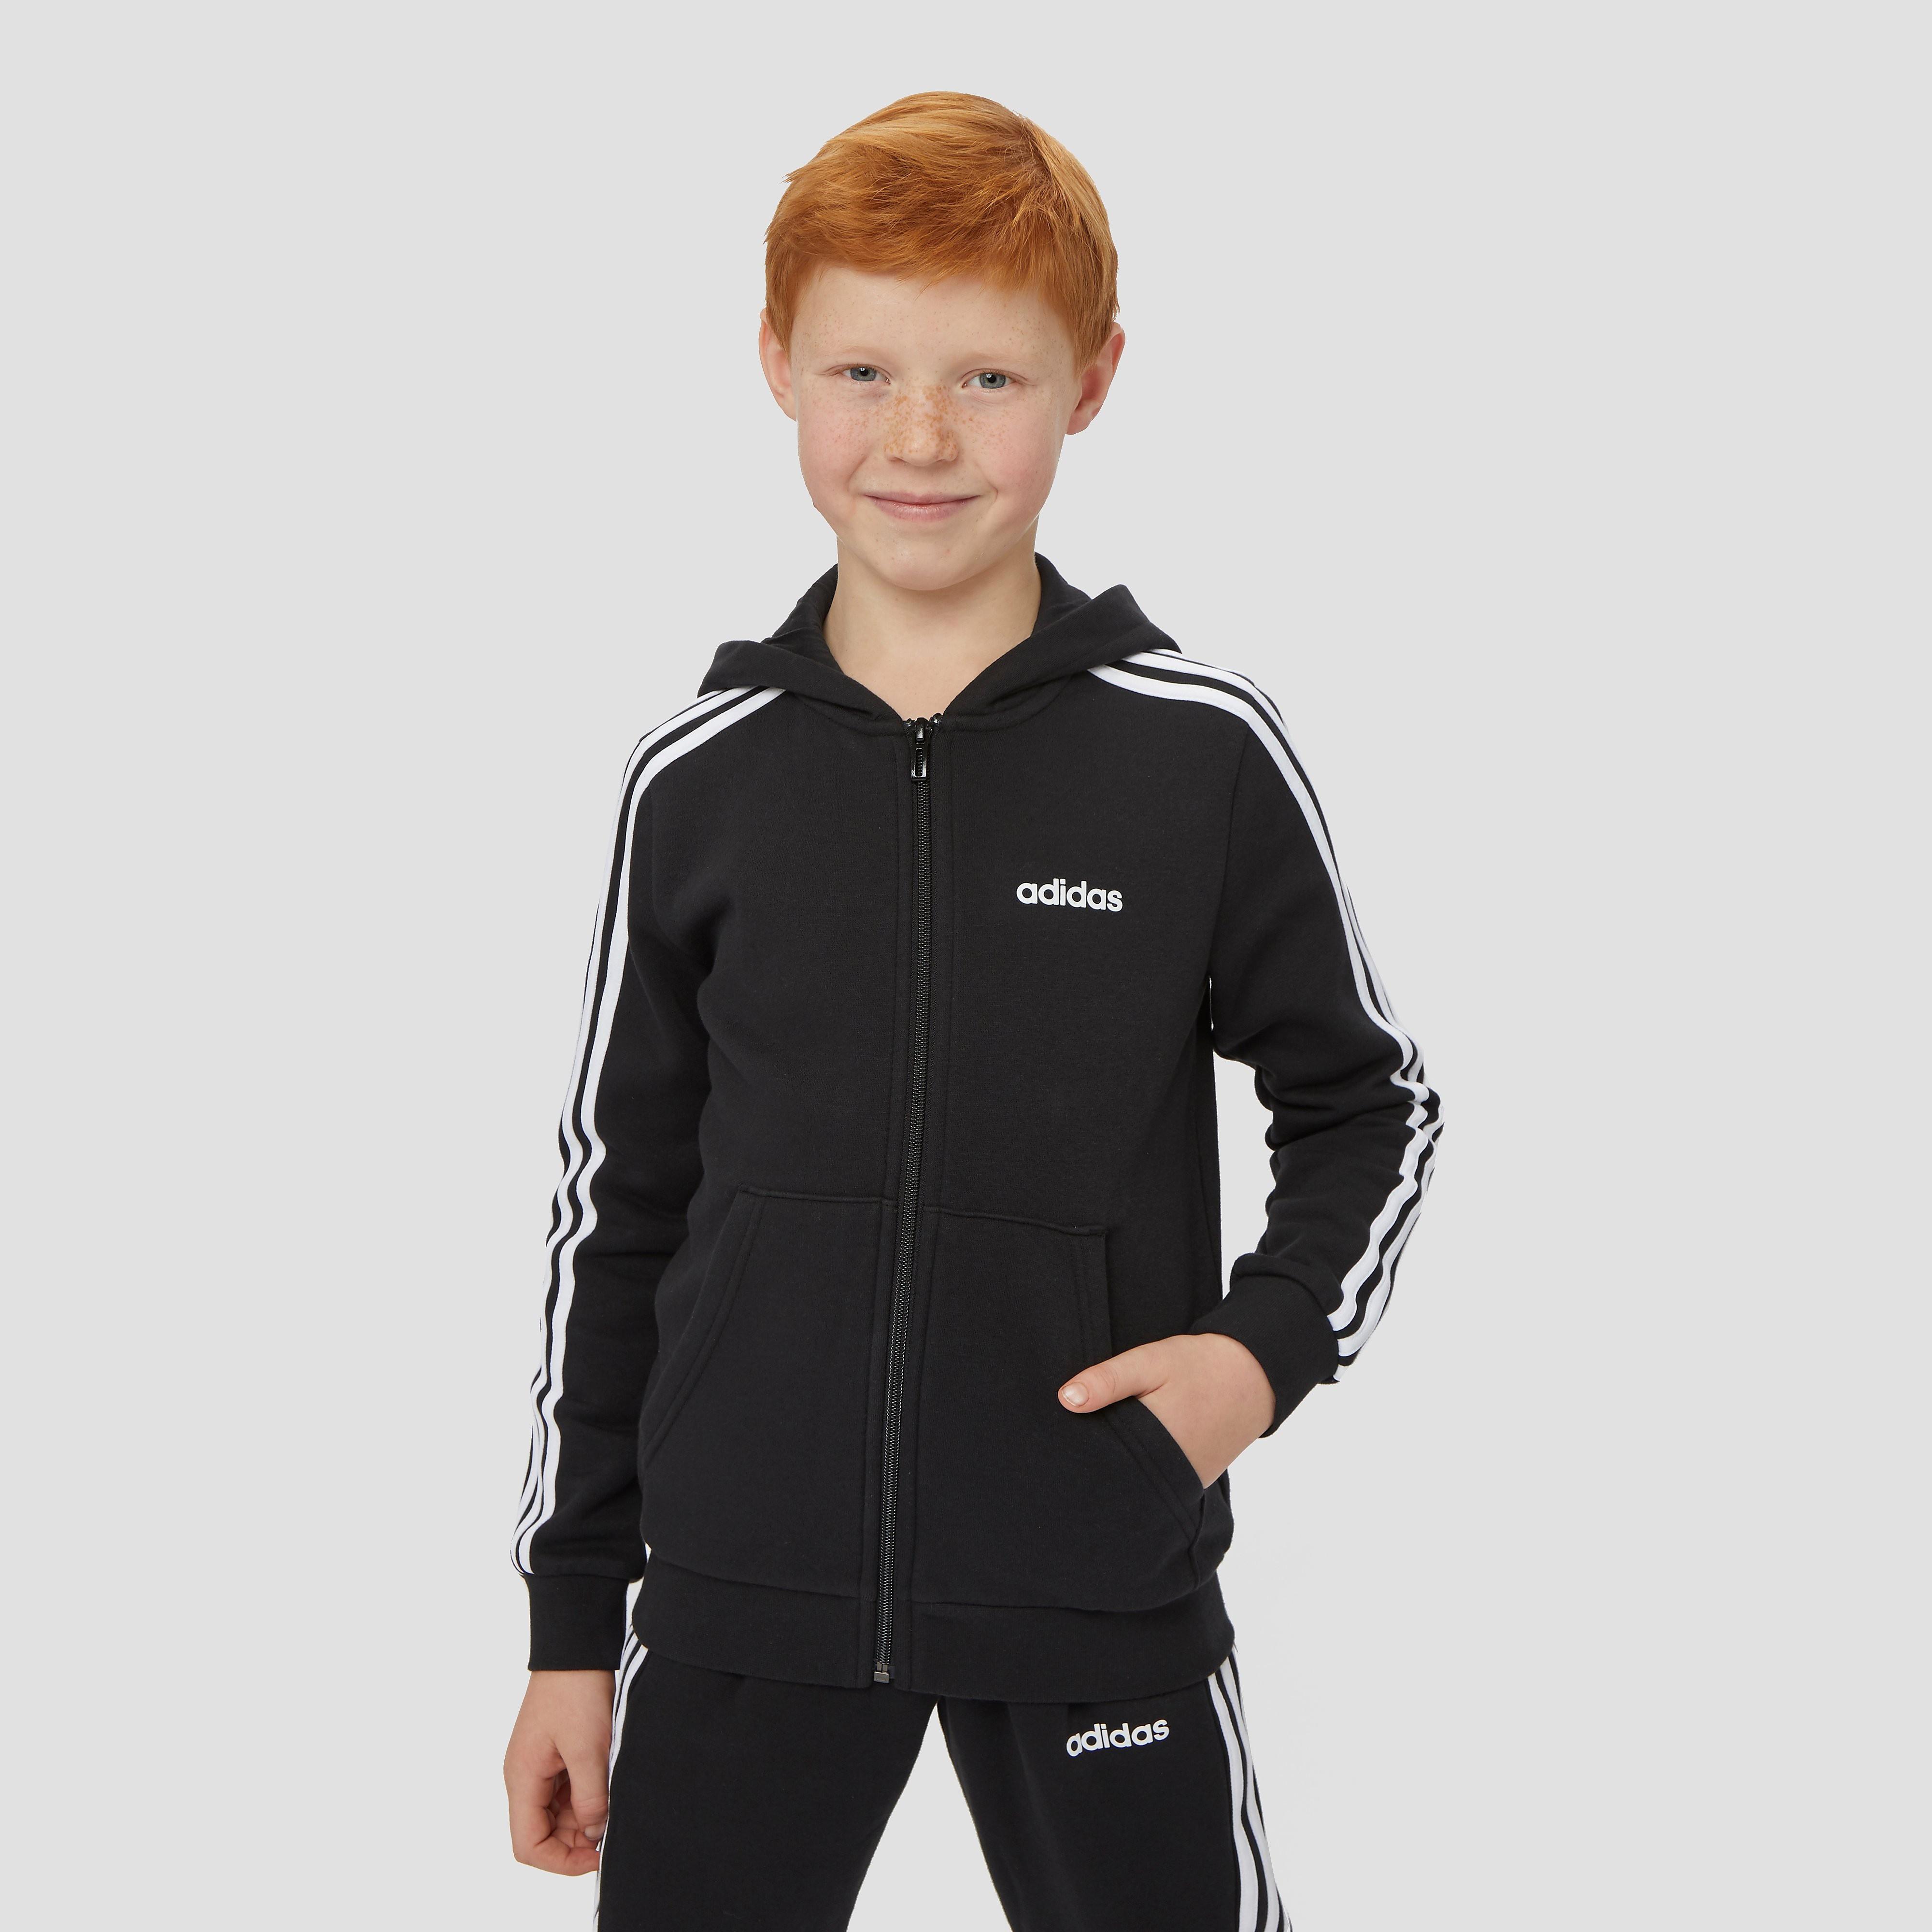 adidas Essentials 3-stripes vest kinderen Kinderen